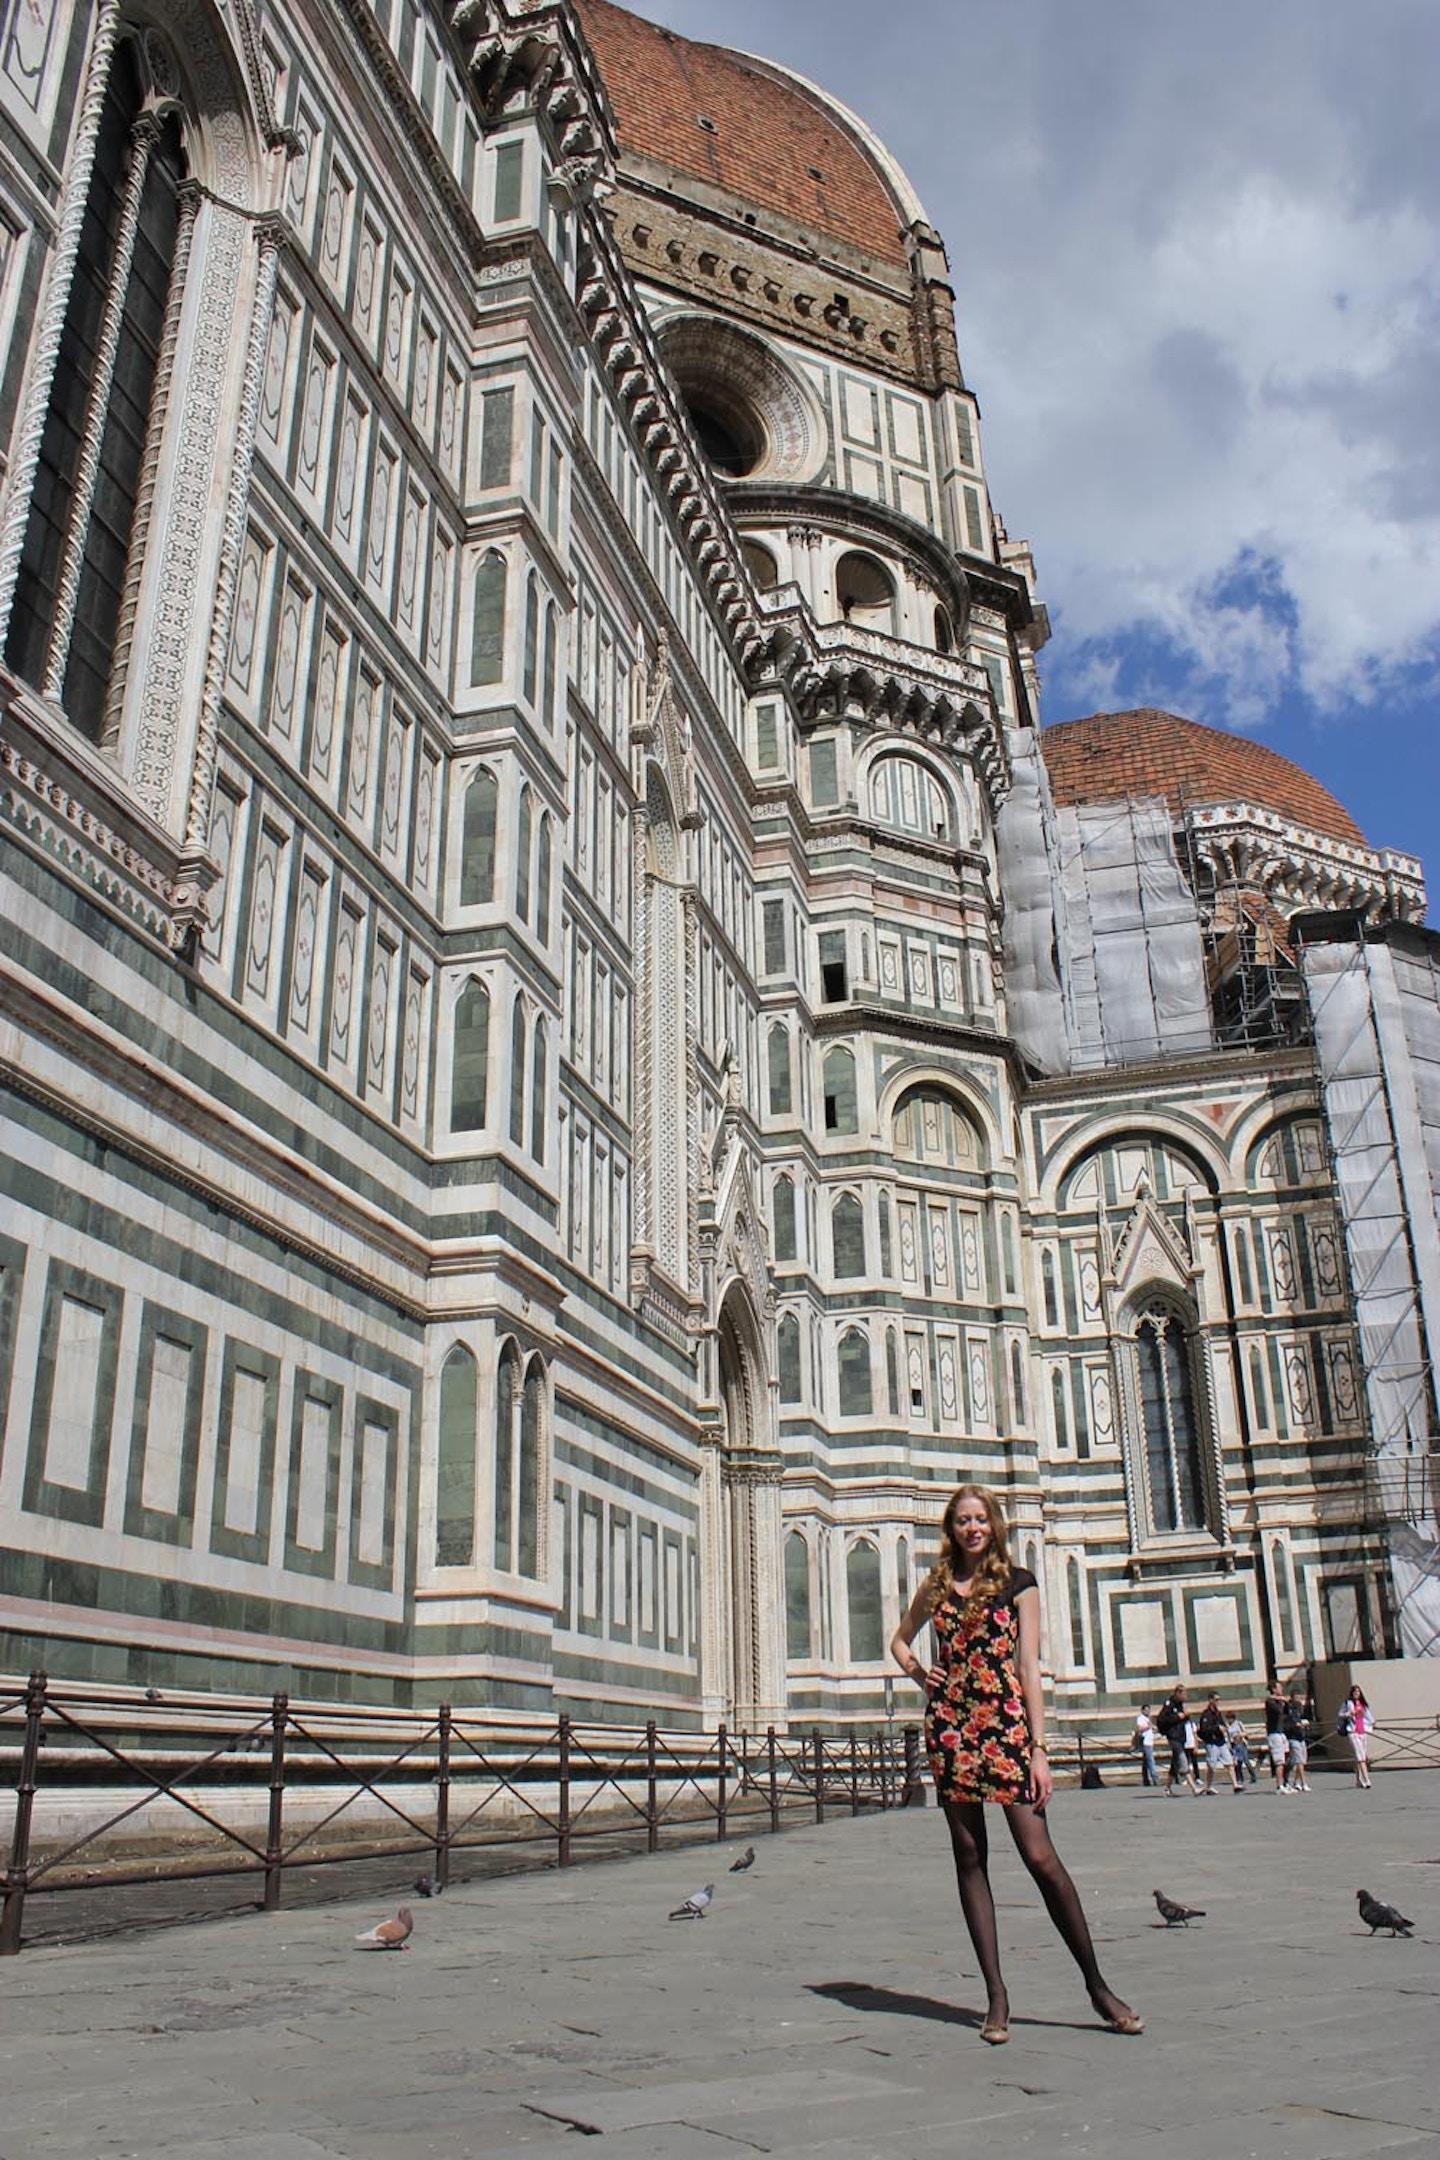 Florence Duomo